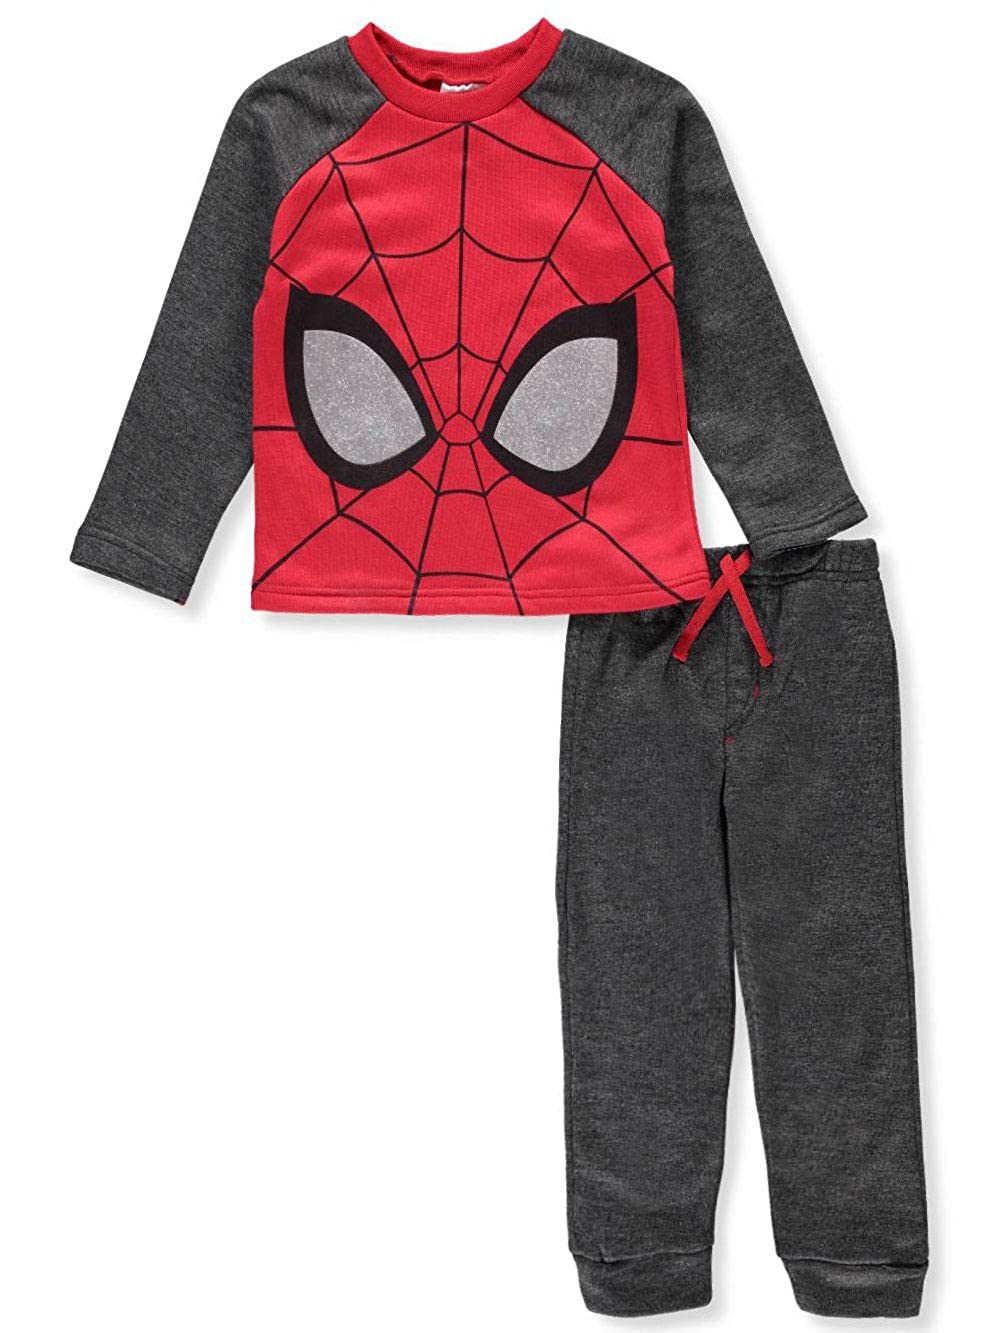 Spider-Man Boys' 2-Piece Pants Set Outfit